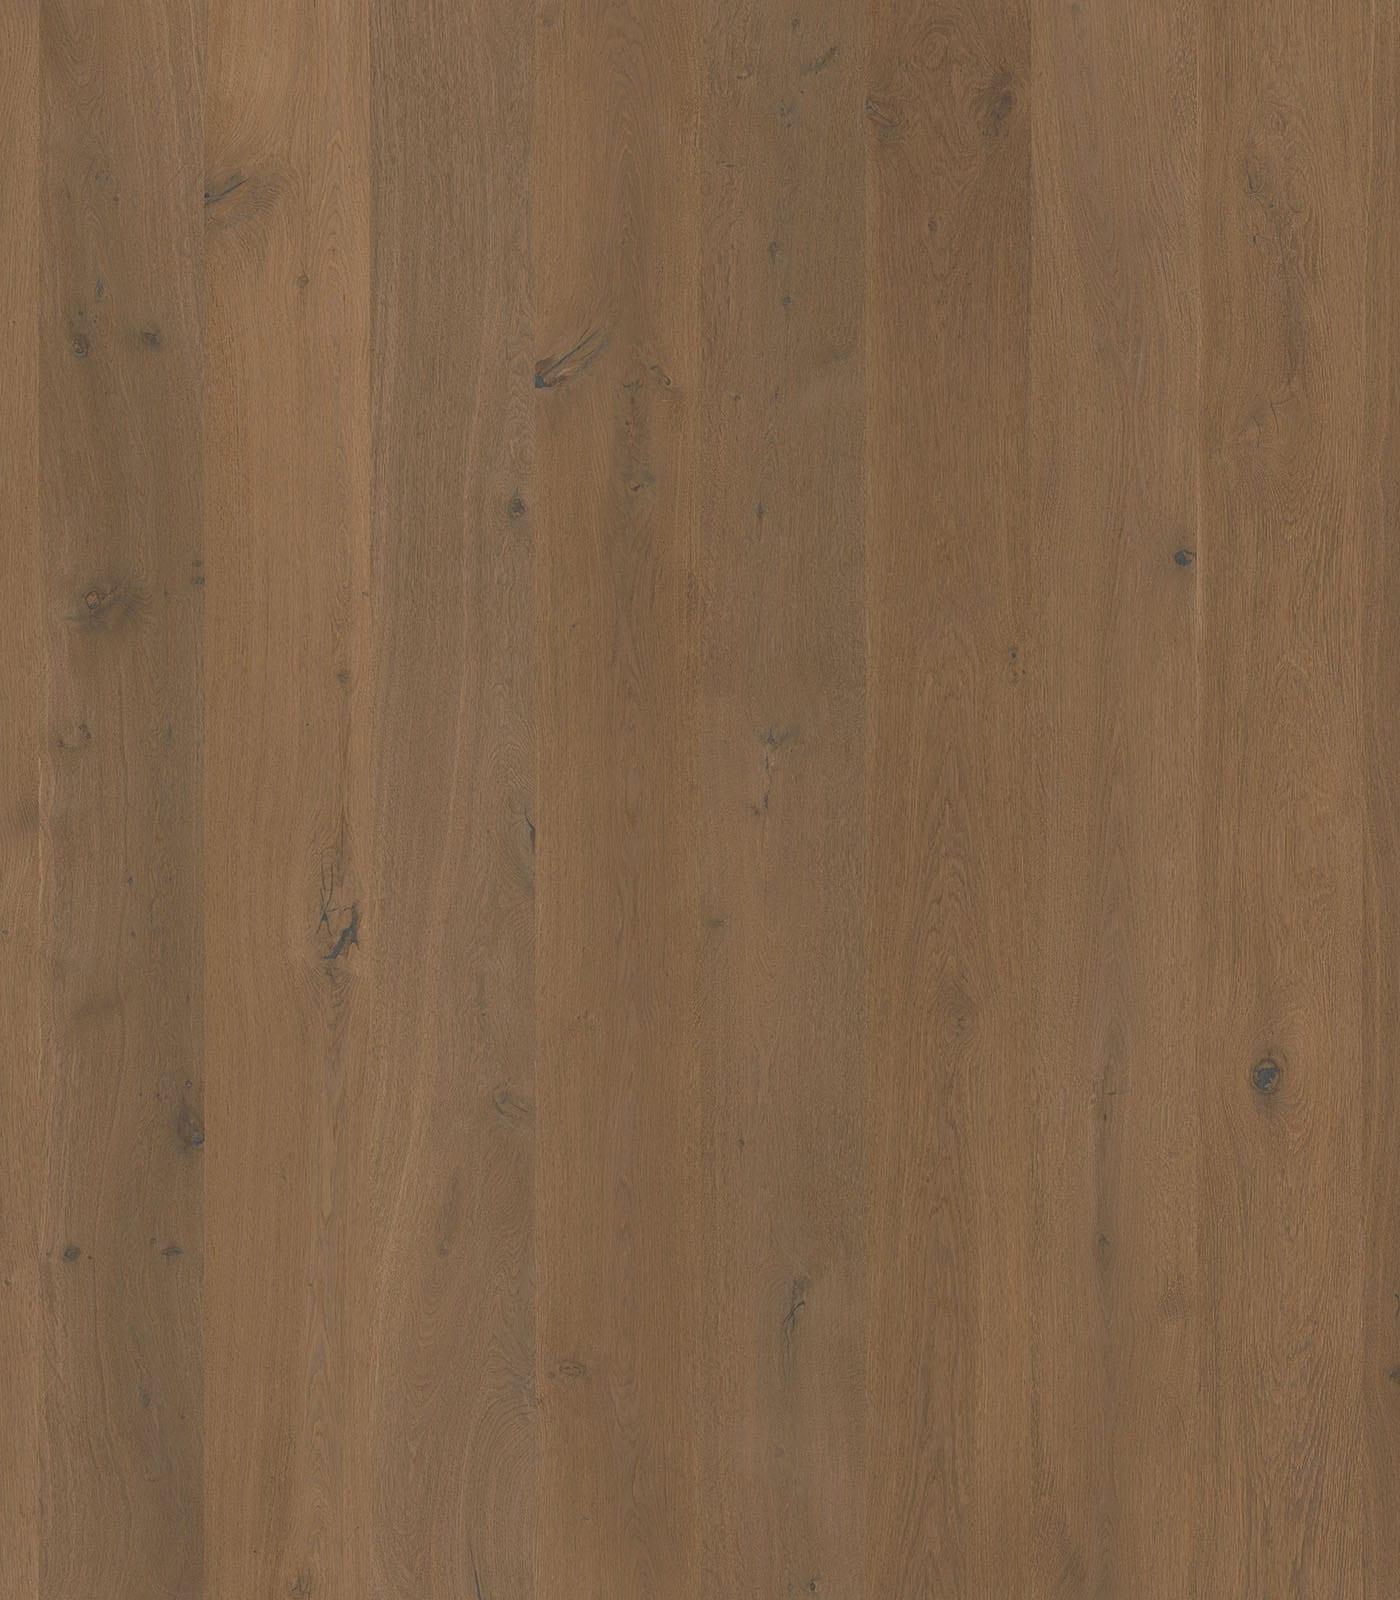 Myrtle Beach-European oak Engineered flooring-Lifestyle-flat